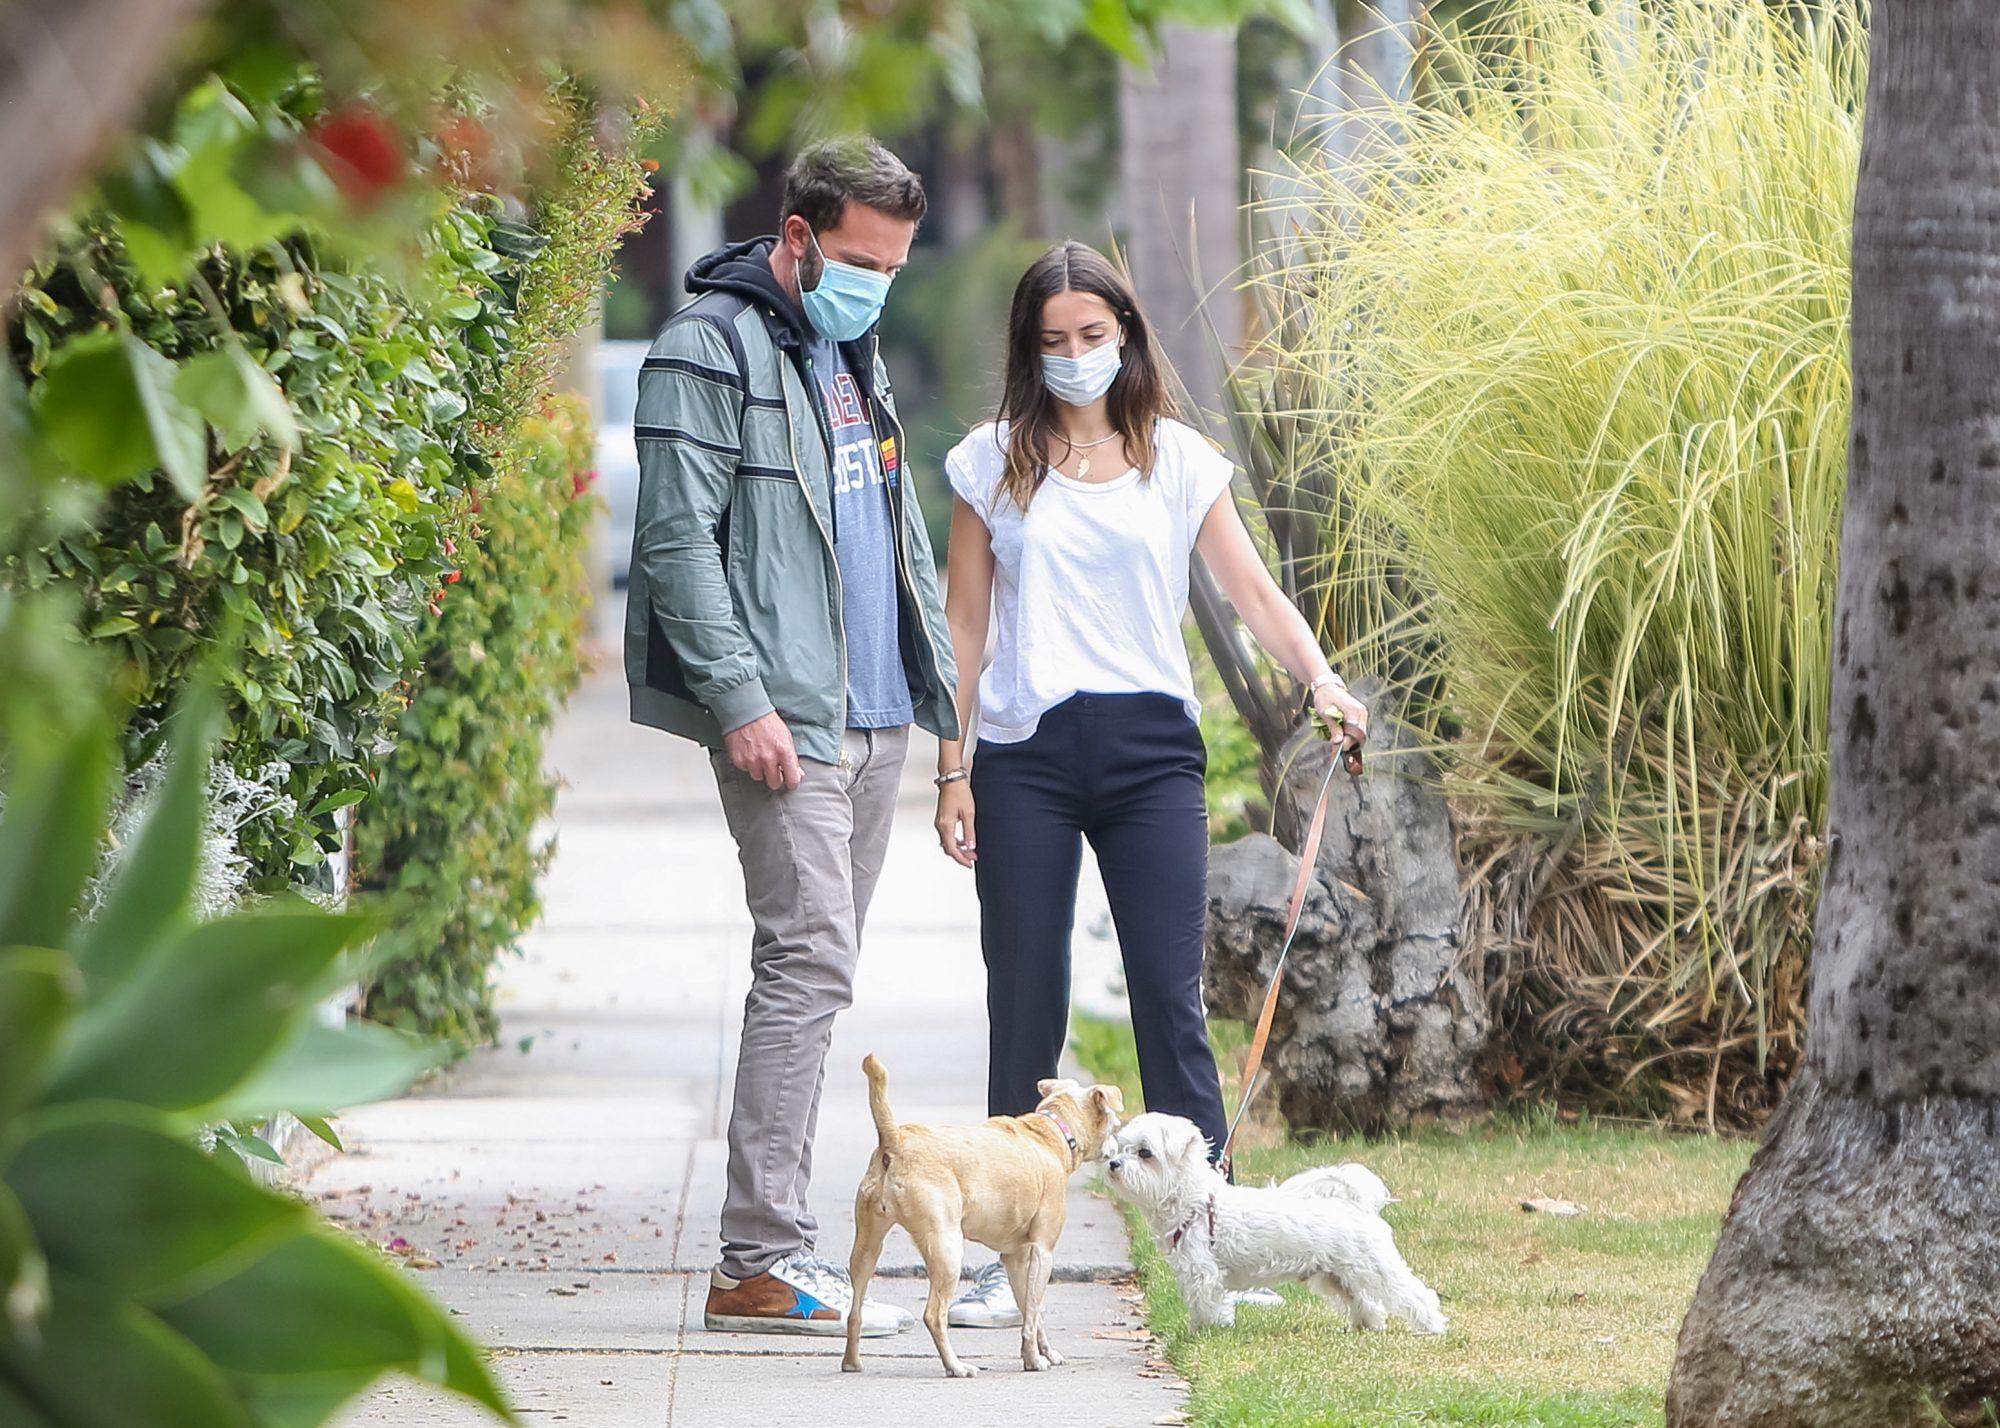 Ben Affleck And Ana De Armas Went On A Double Date With Matt Damon And Luciana Barroso Ben Affleck Matt Damon Ben Affleck News